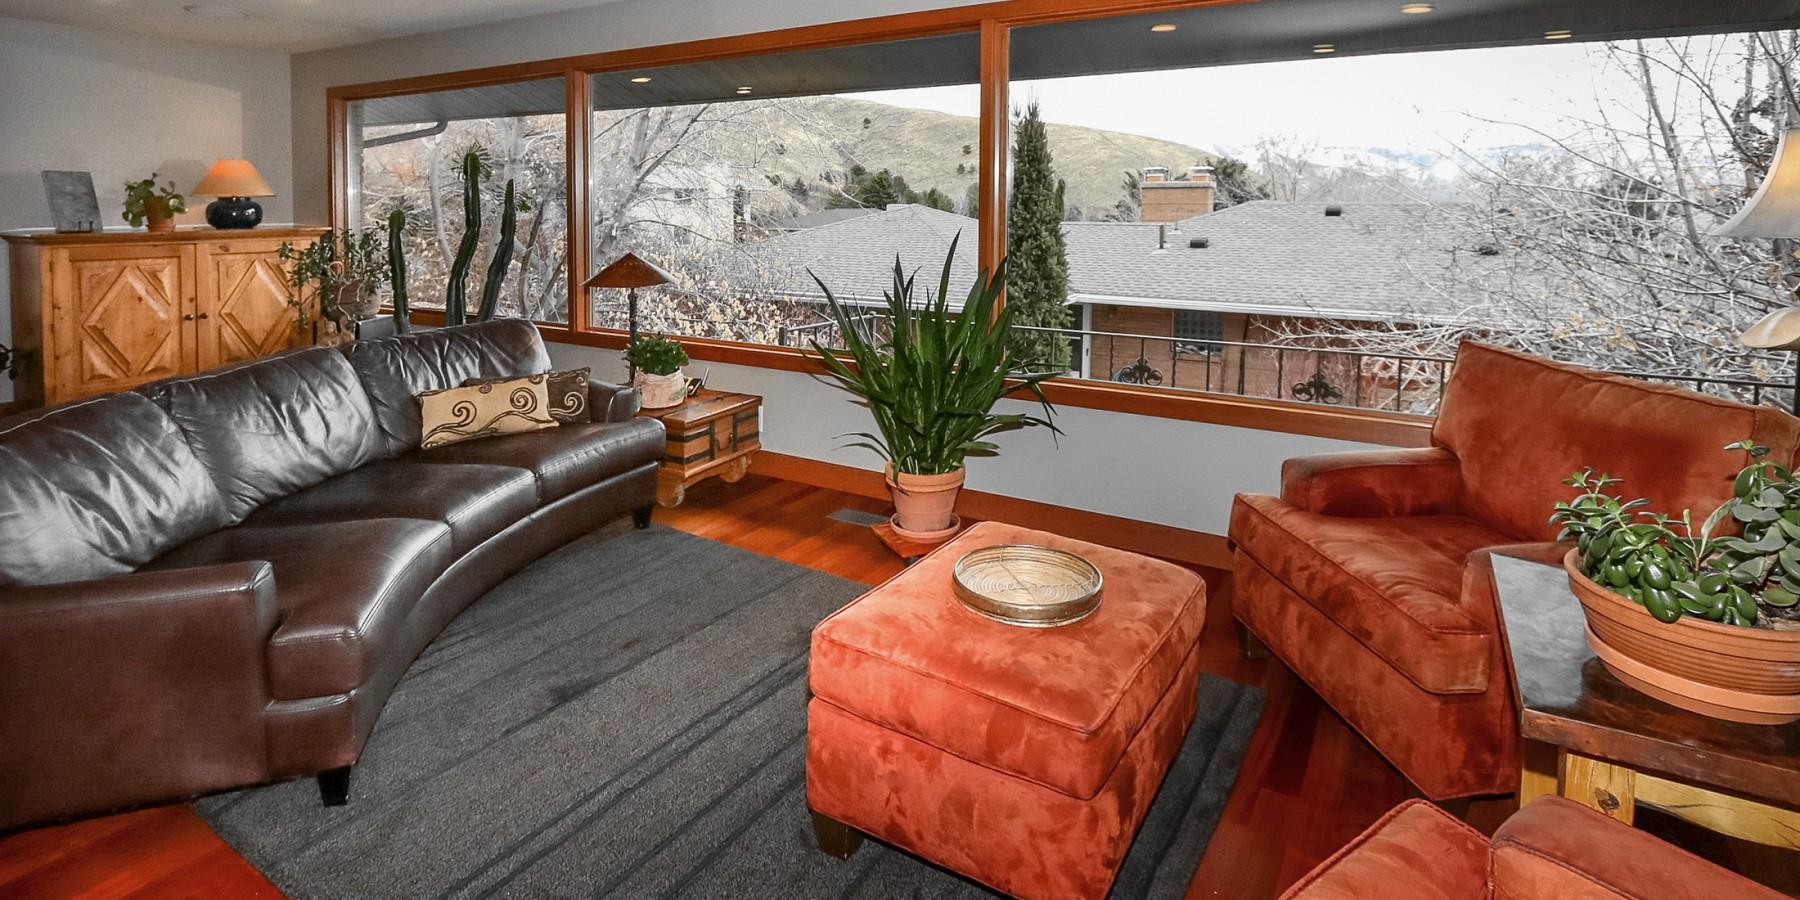 959 N. Terrace Hills Drive, Salt Lake City, UT 84103